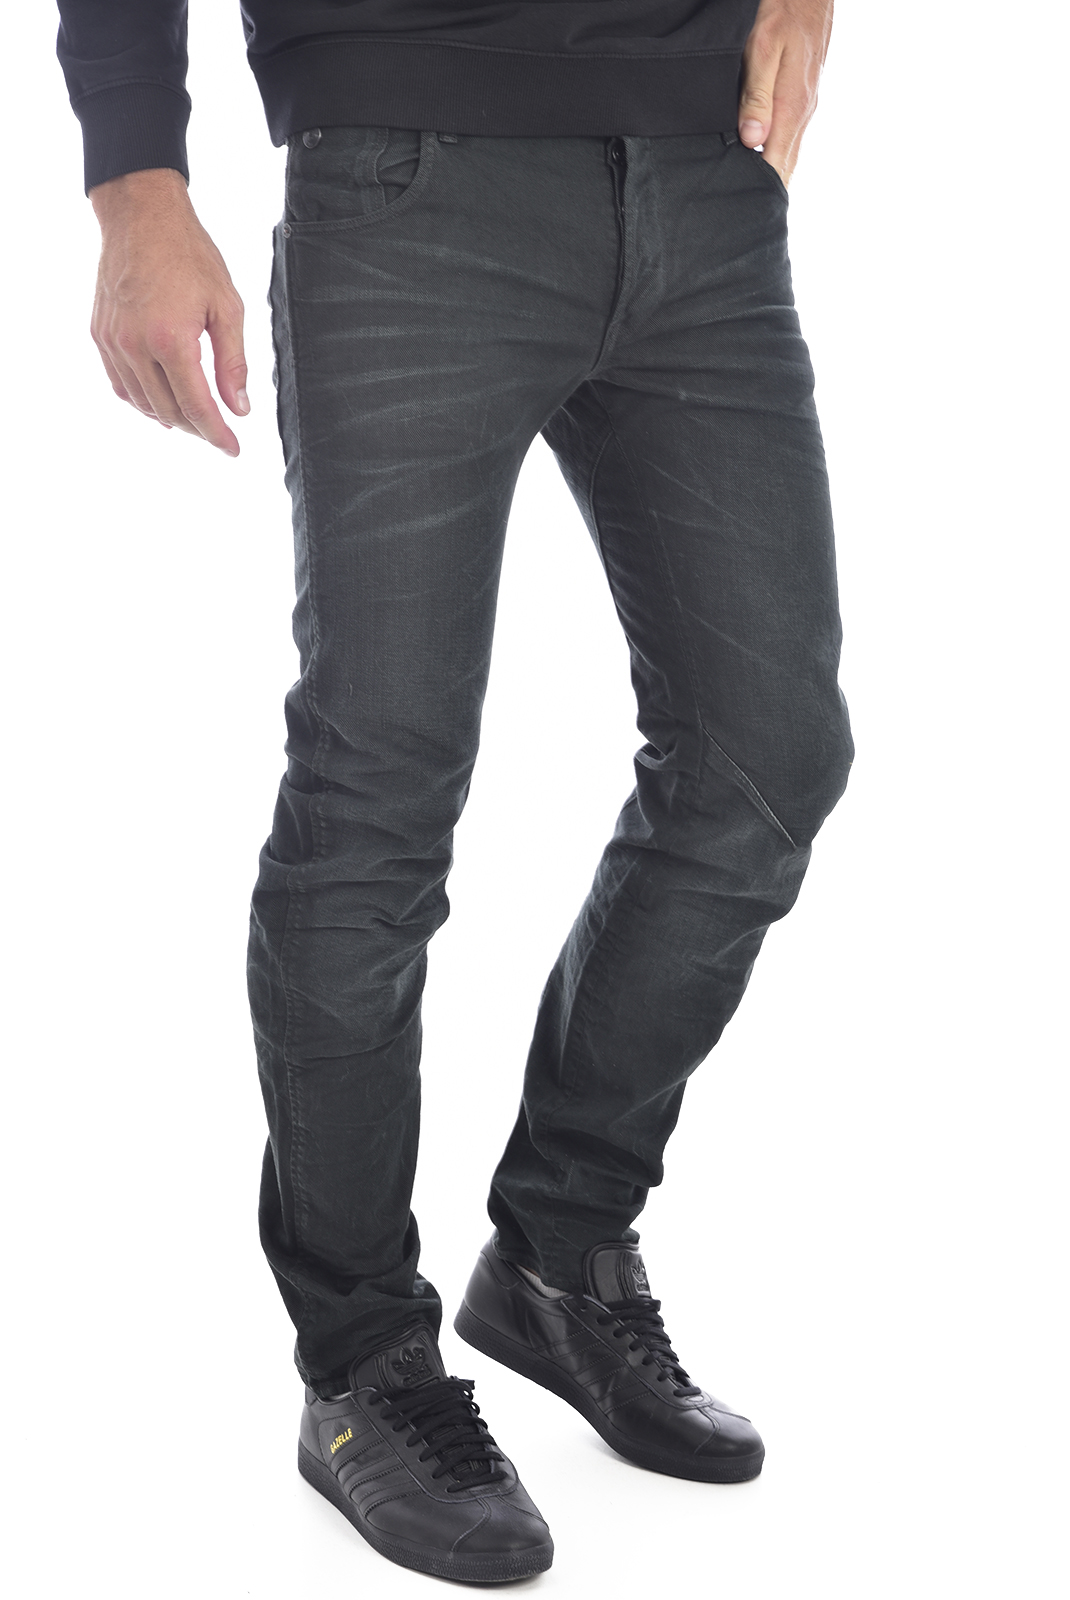 Jeans  G-star 51030F-5683-4504 arc vert